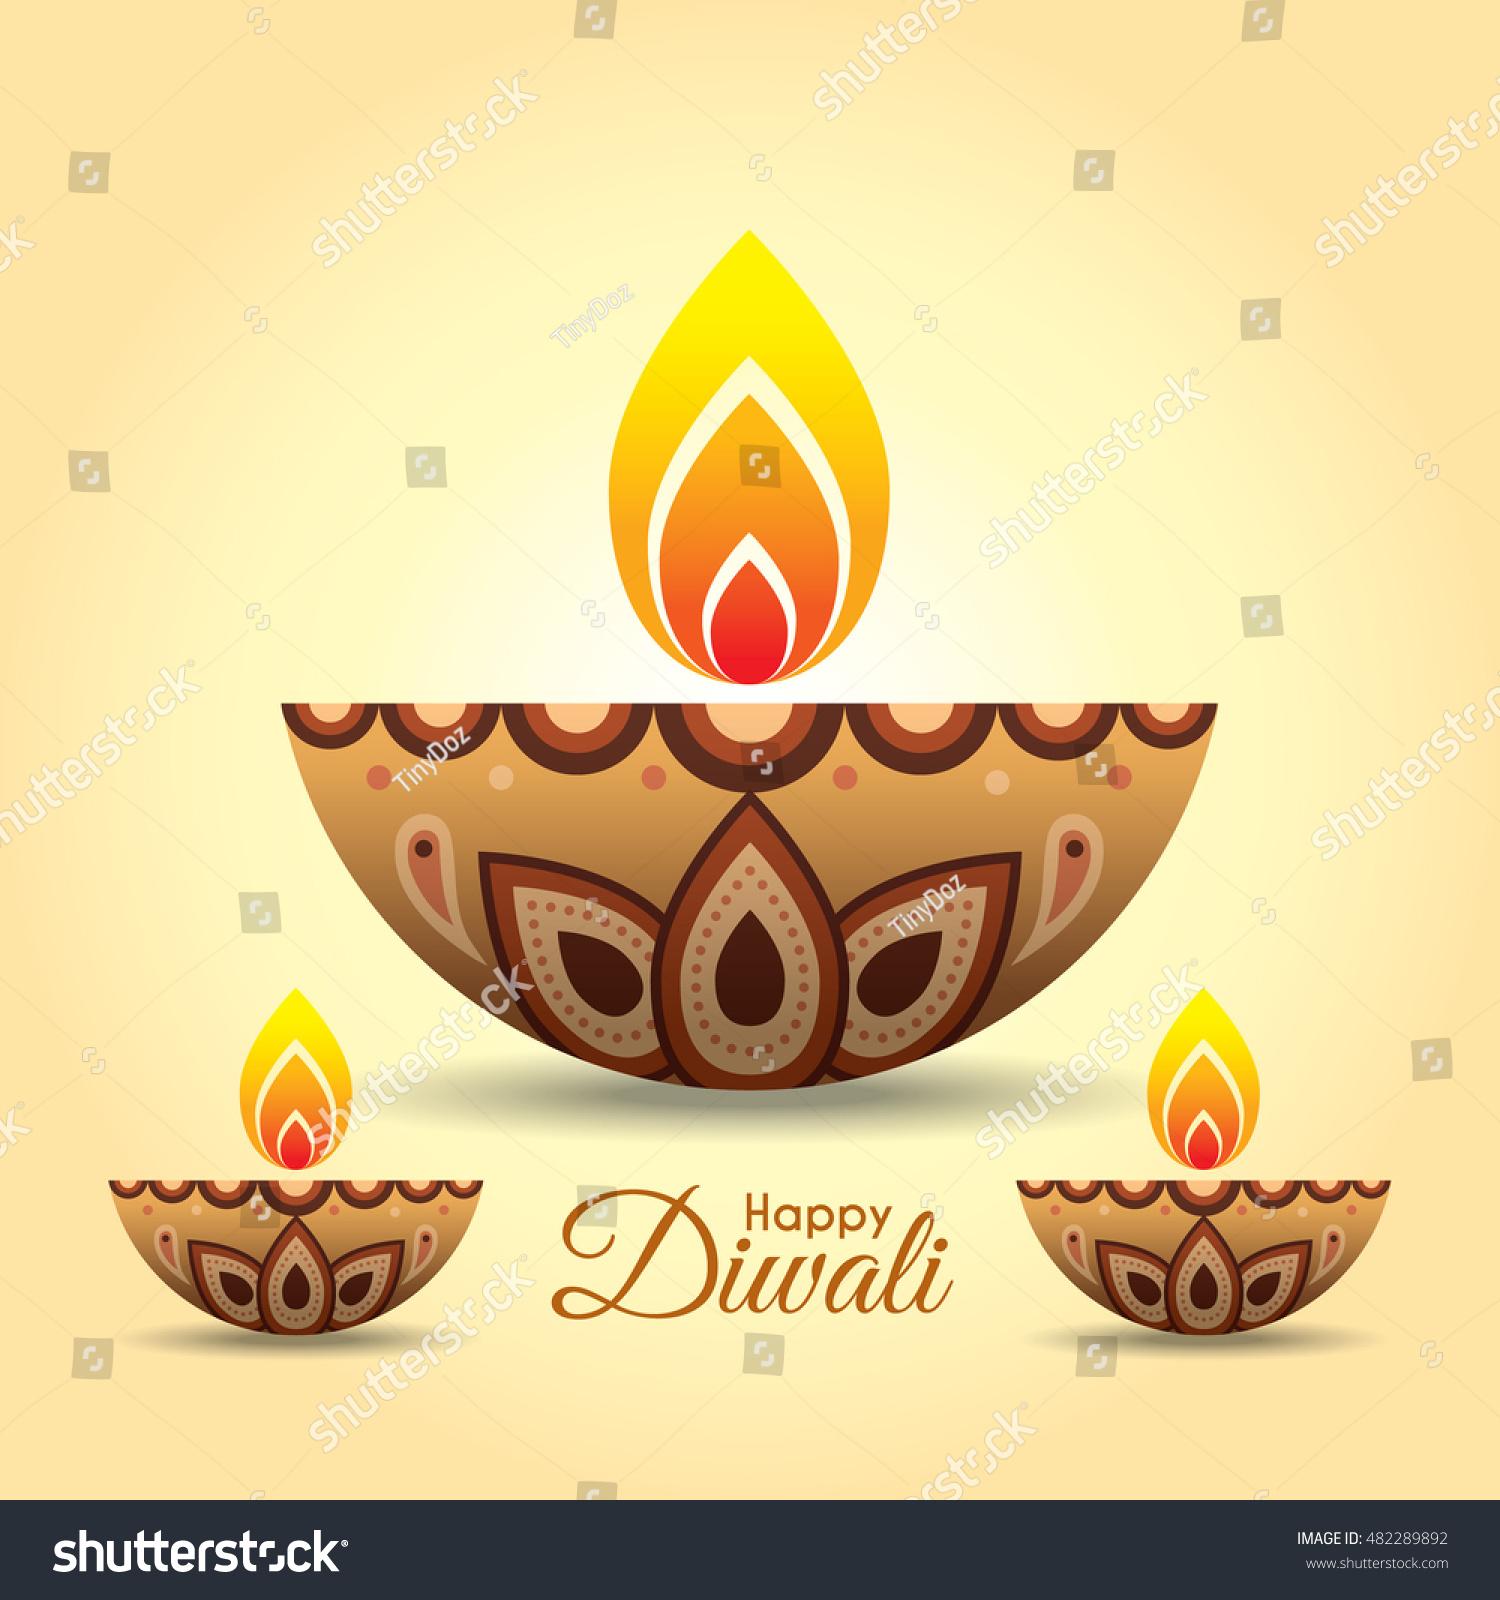 Diwali Utsav Greeting Or Poster Card Ez Canvas